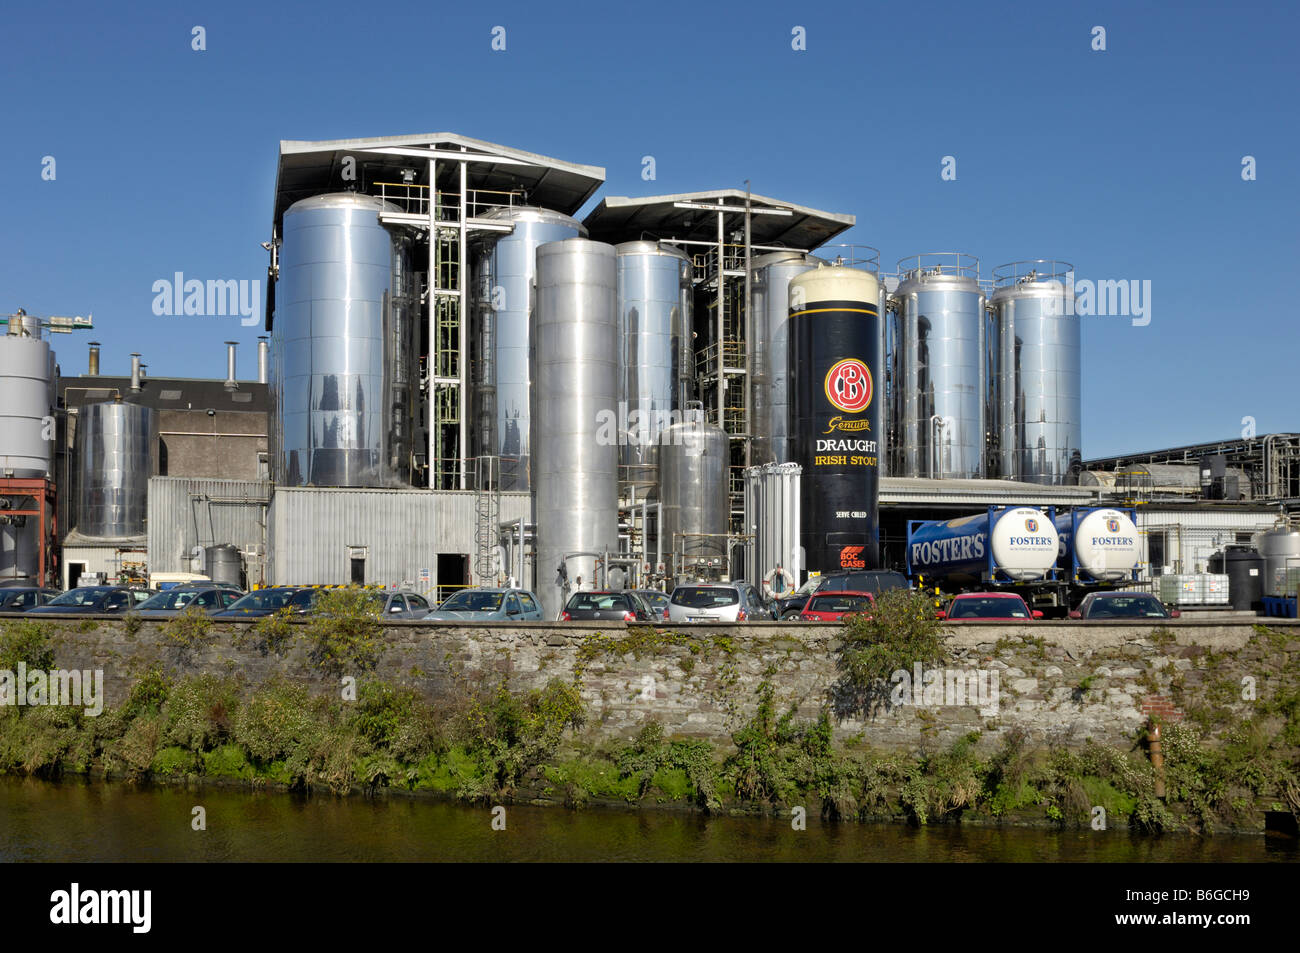 Beamish Crawford Irish stout brewery - Stock Image